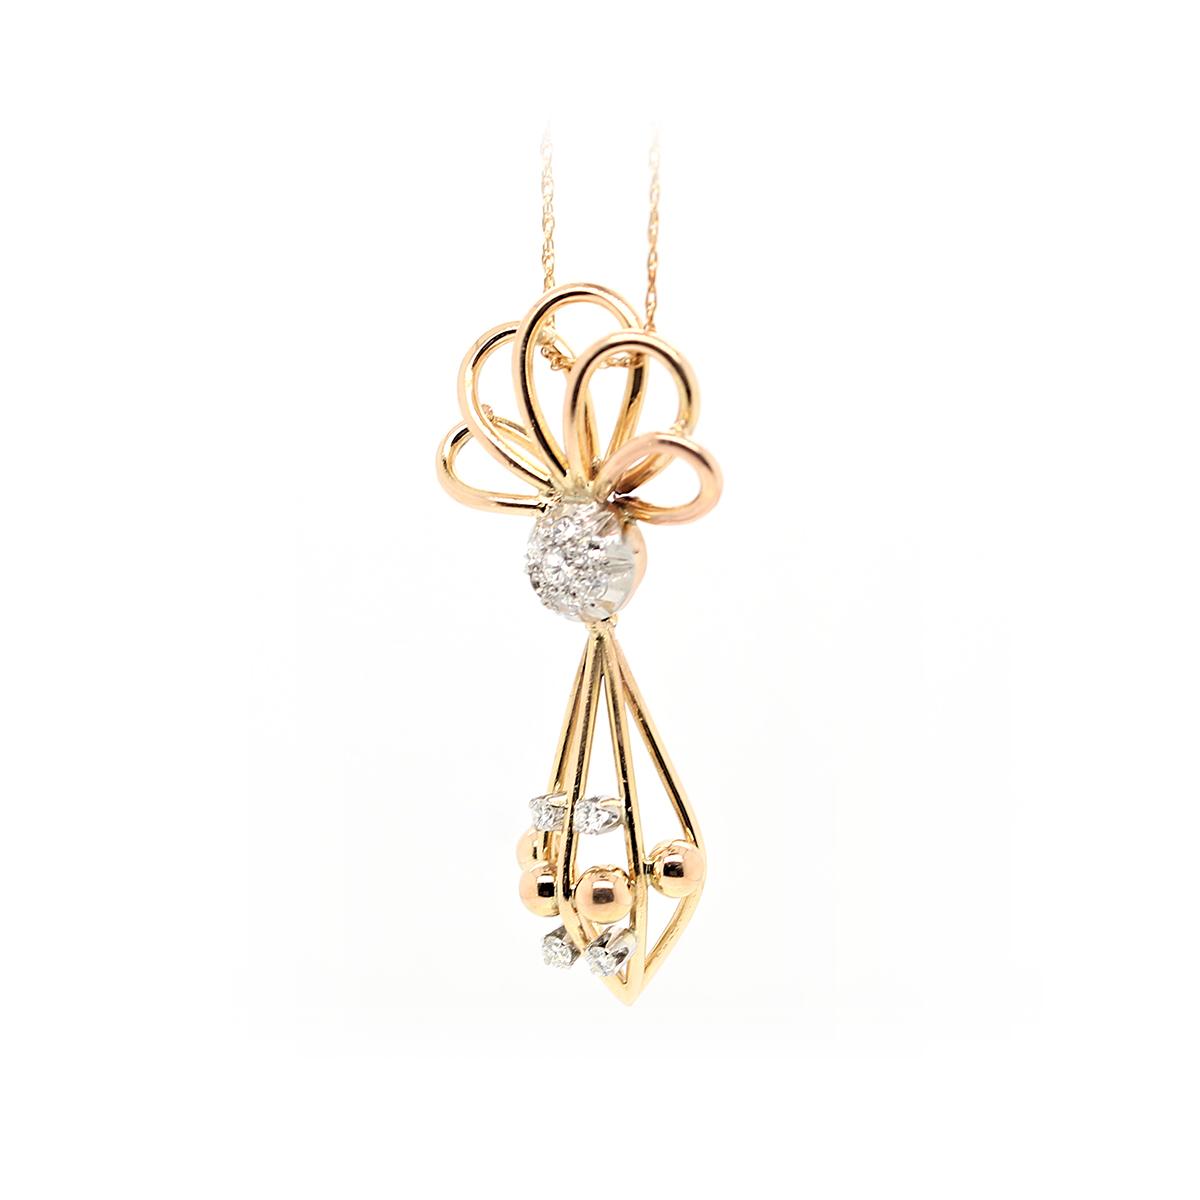 Vintage 18 Karat Yellow Gold Diamond Geometric Pendant Necklace